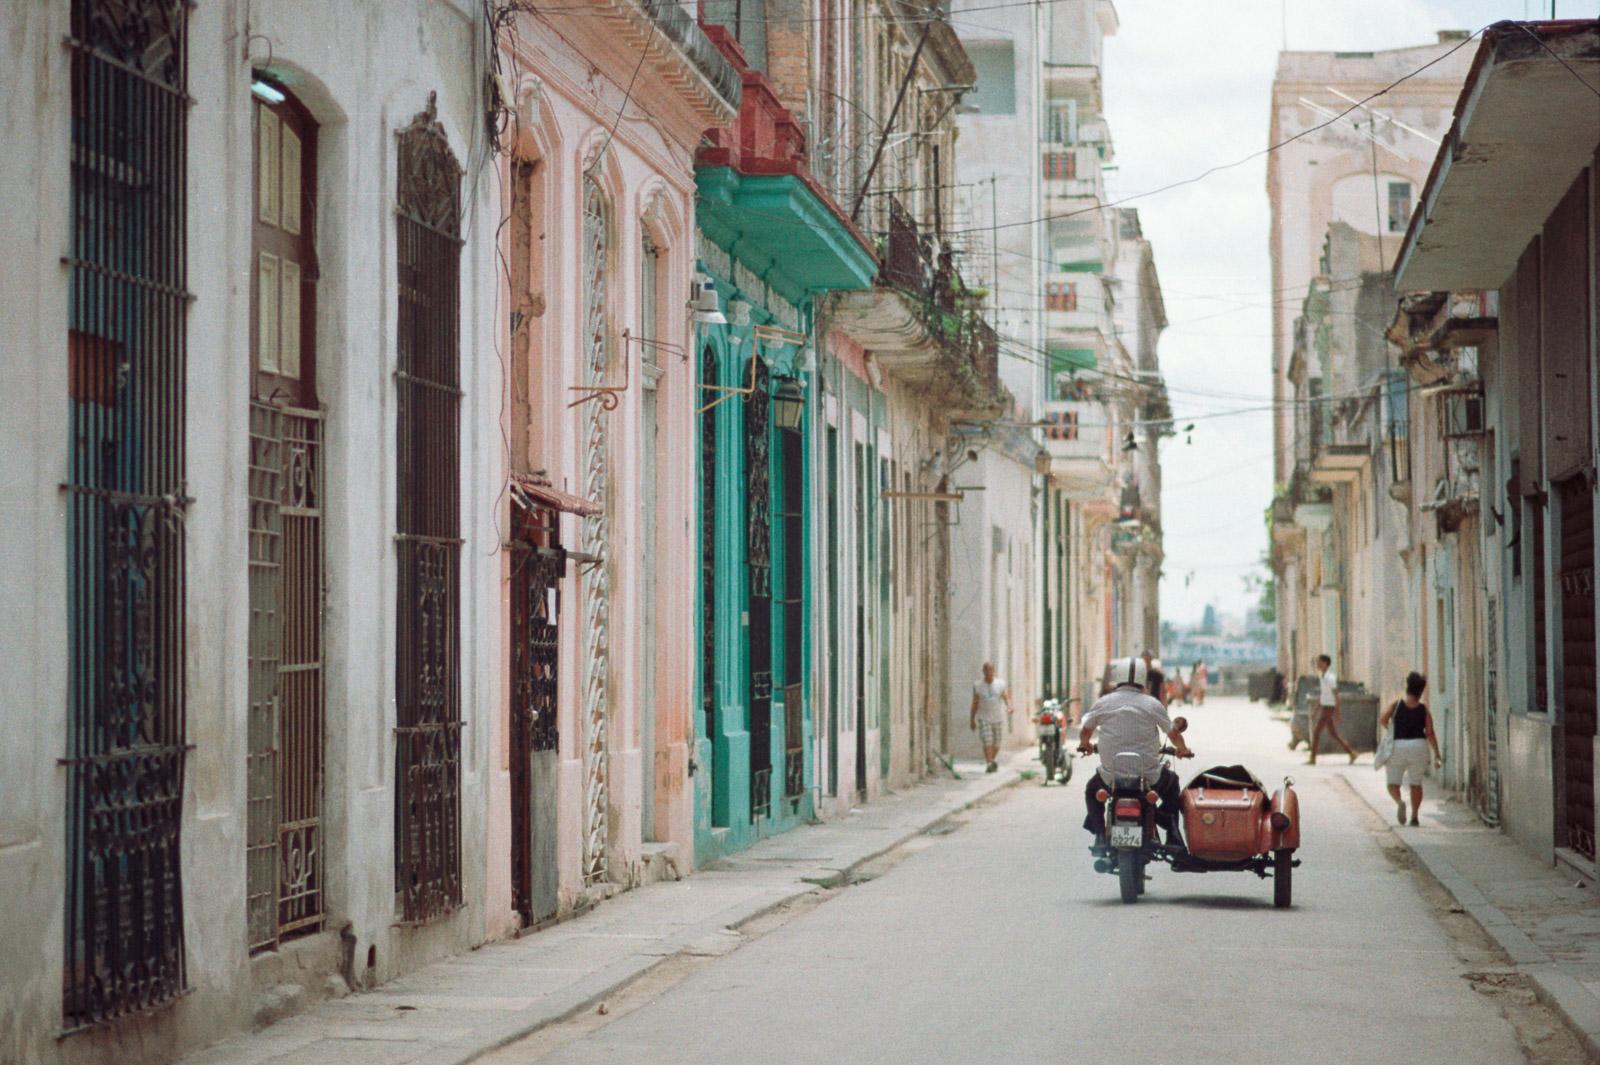 0001-cuba-travelphotography-10-cuba-pro-100-7.jpg